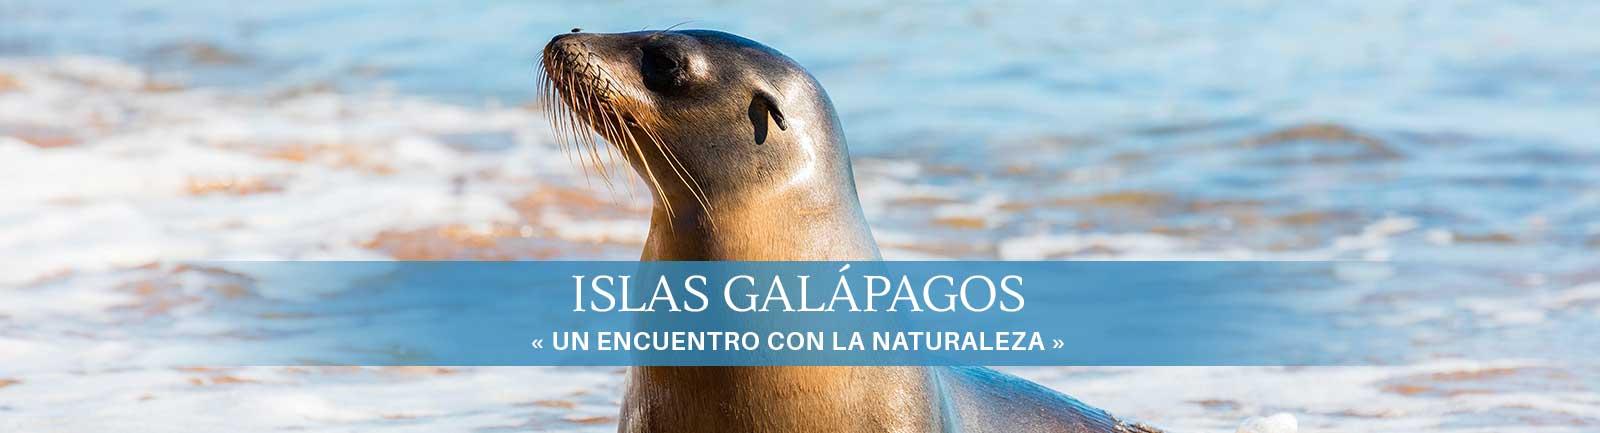 Destino Islas Galápagos